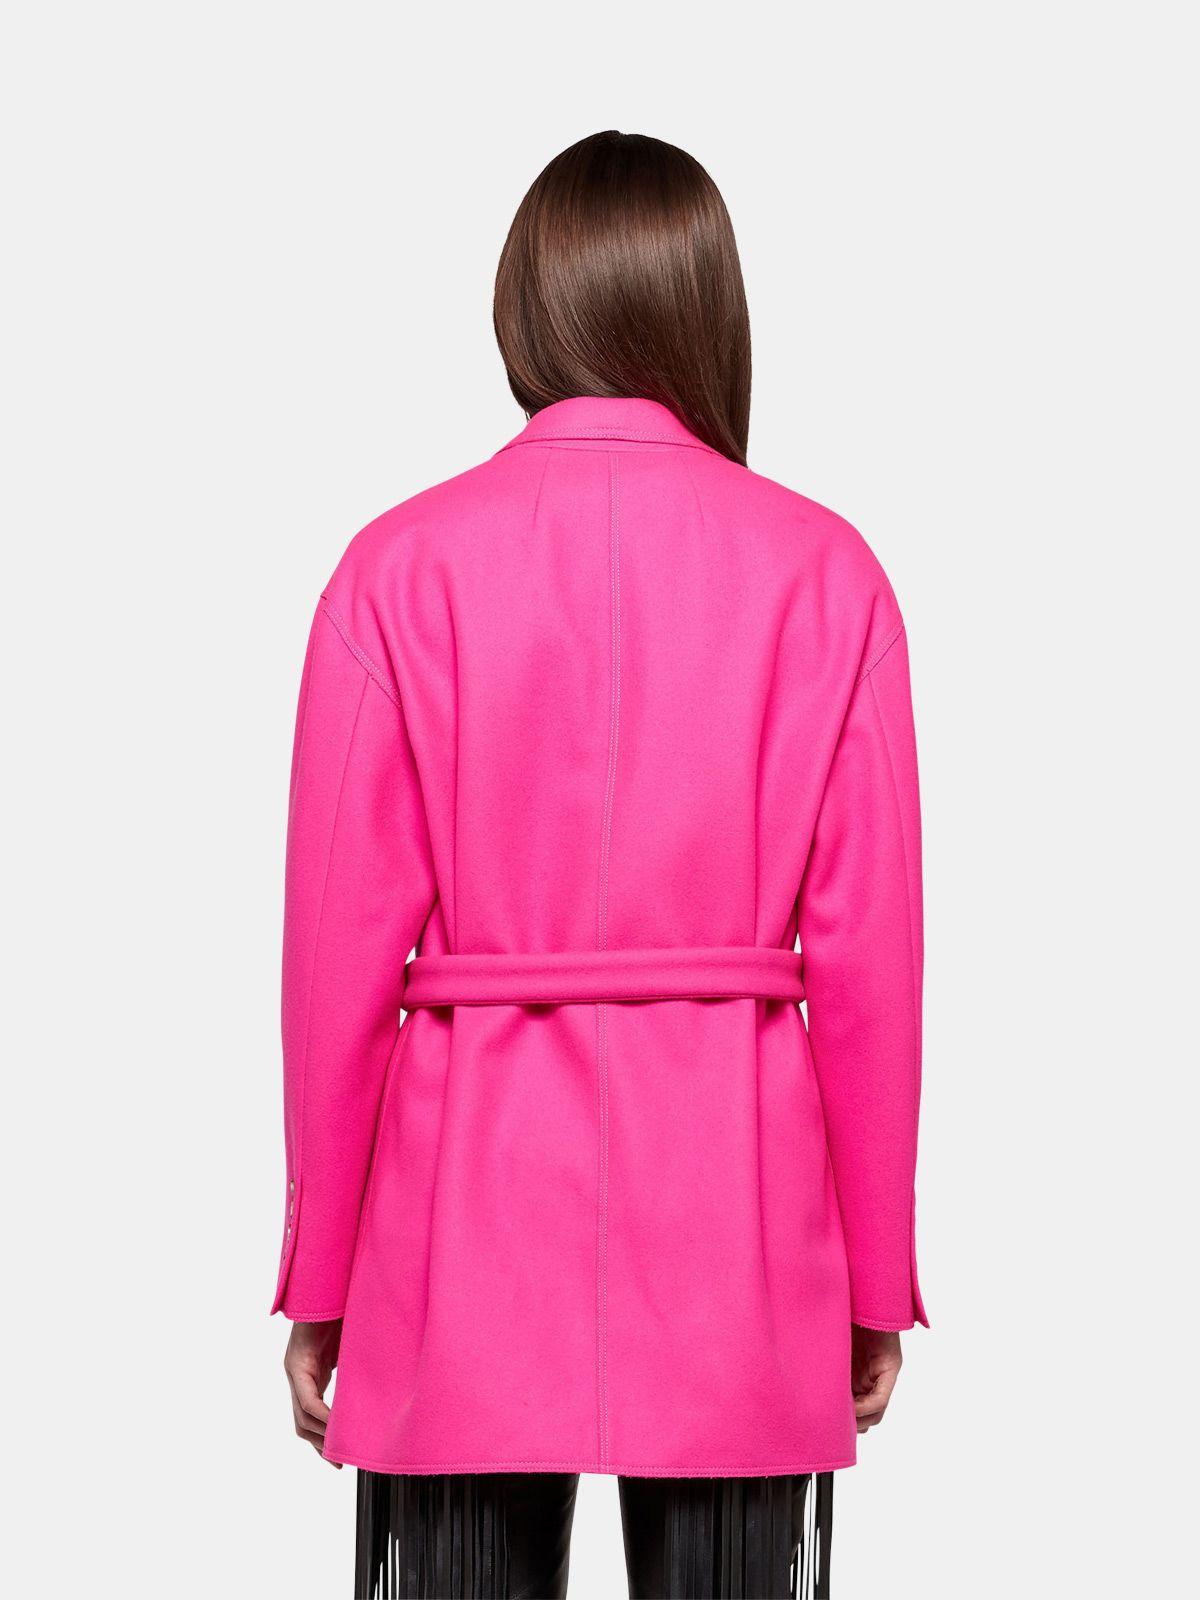 Golden Goose - Giacca Shion oversize in lana con cintura in vita in